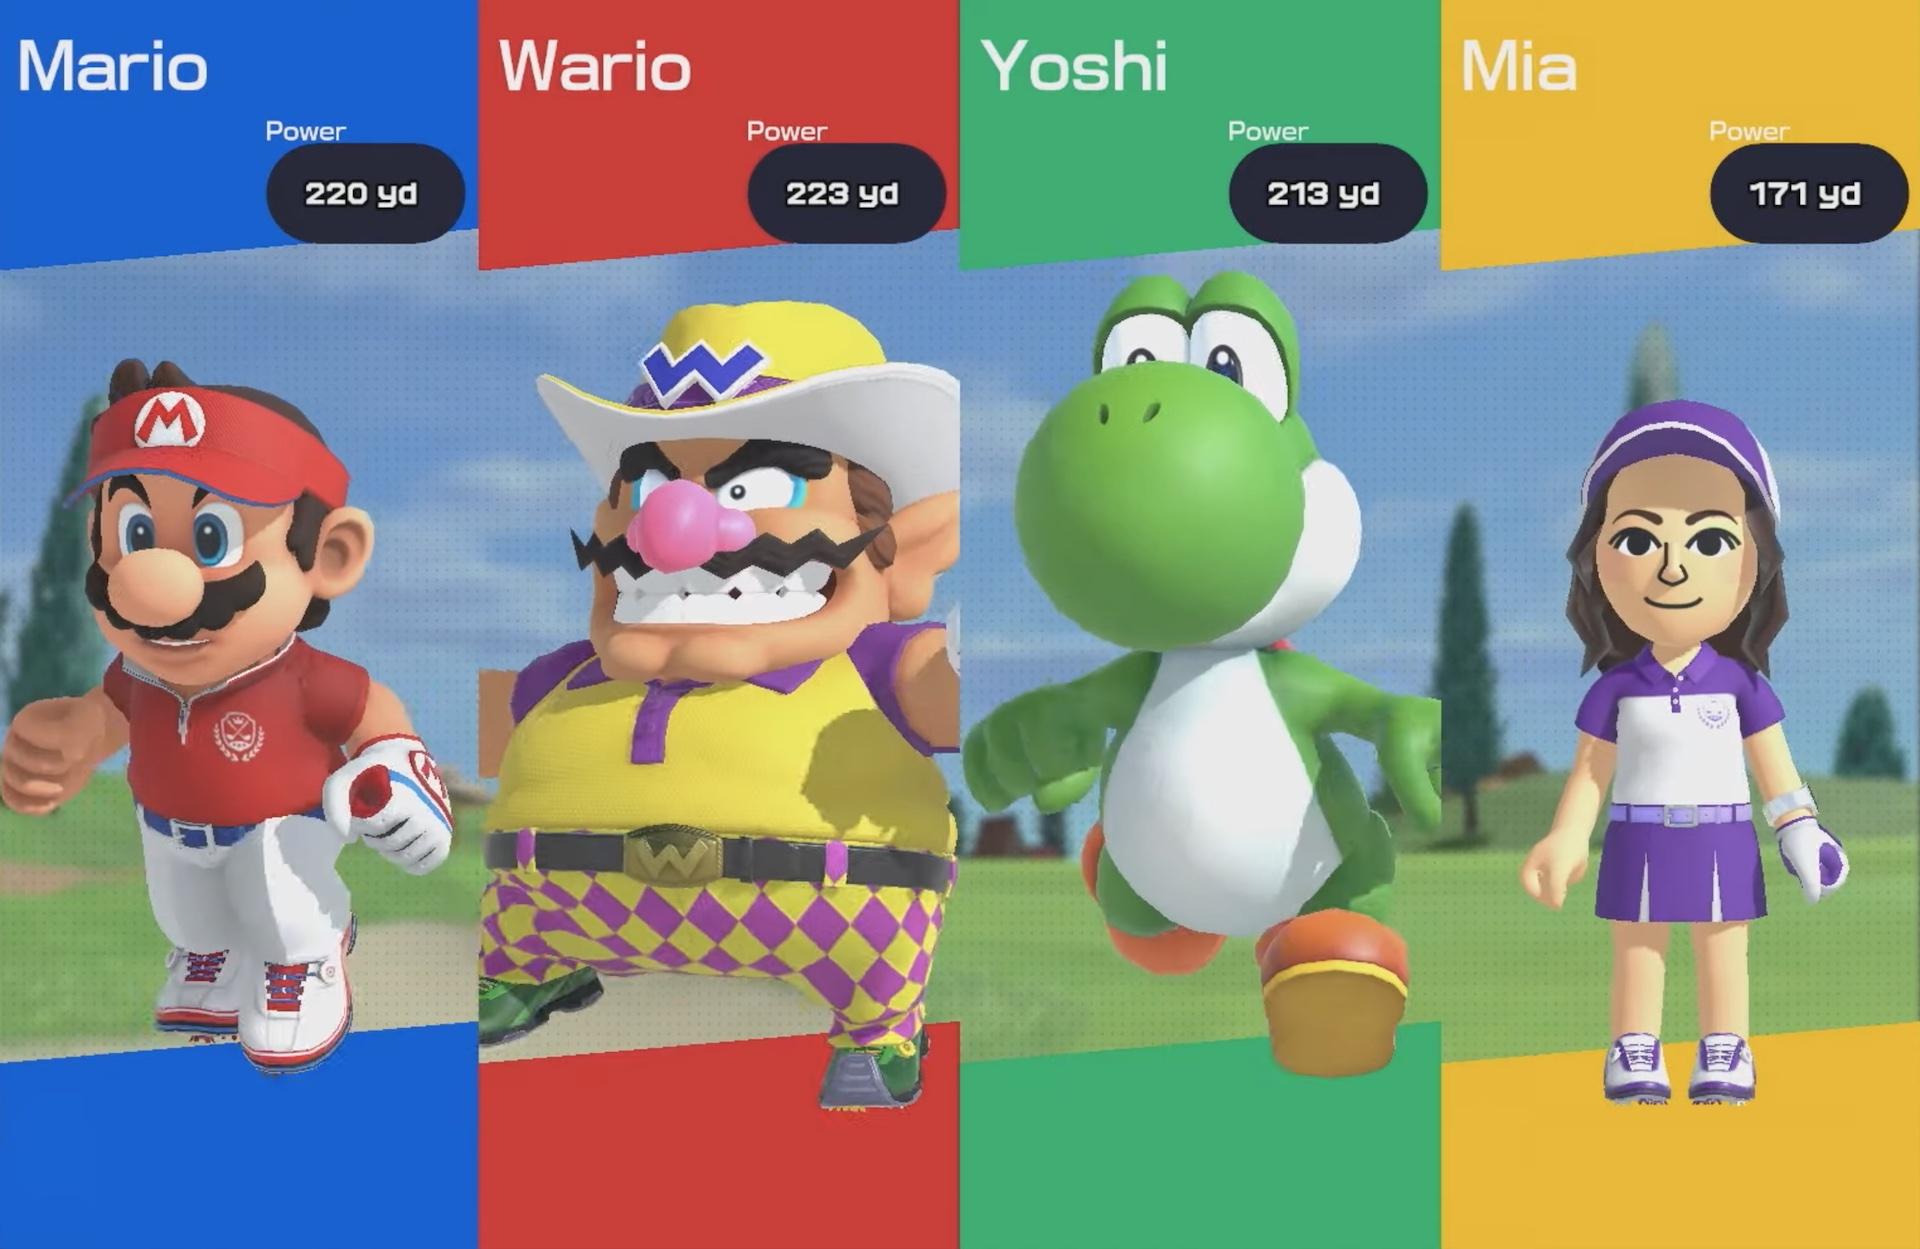 Mario, Wario, Yoshi, and Mia in Mario Golf: Super Rush